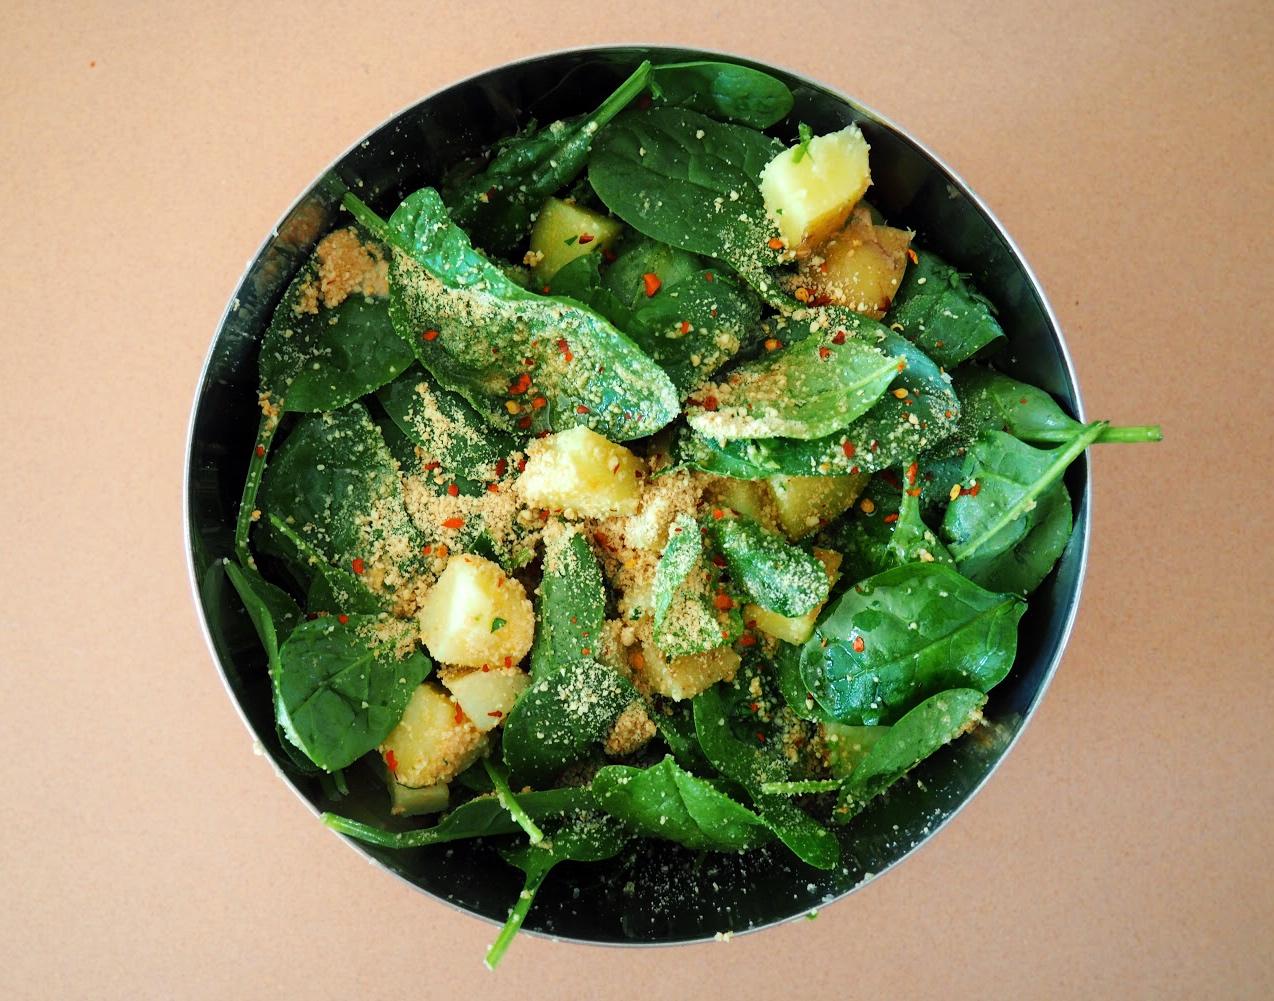 plant-based-new-potato-salad, vegan-new-potato-salad